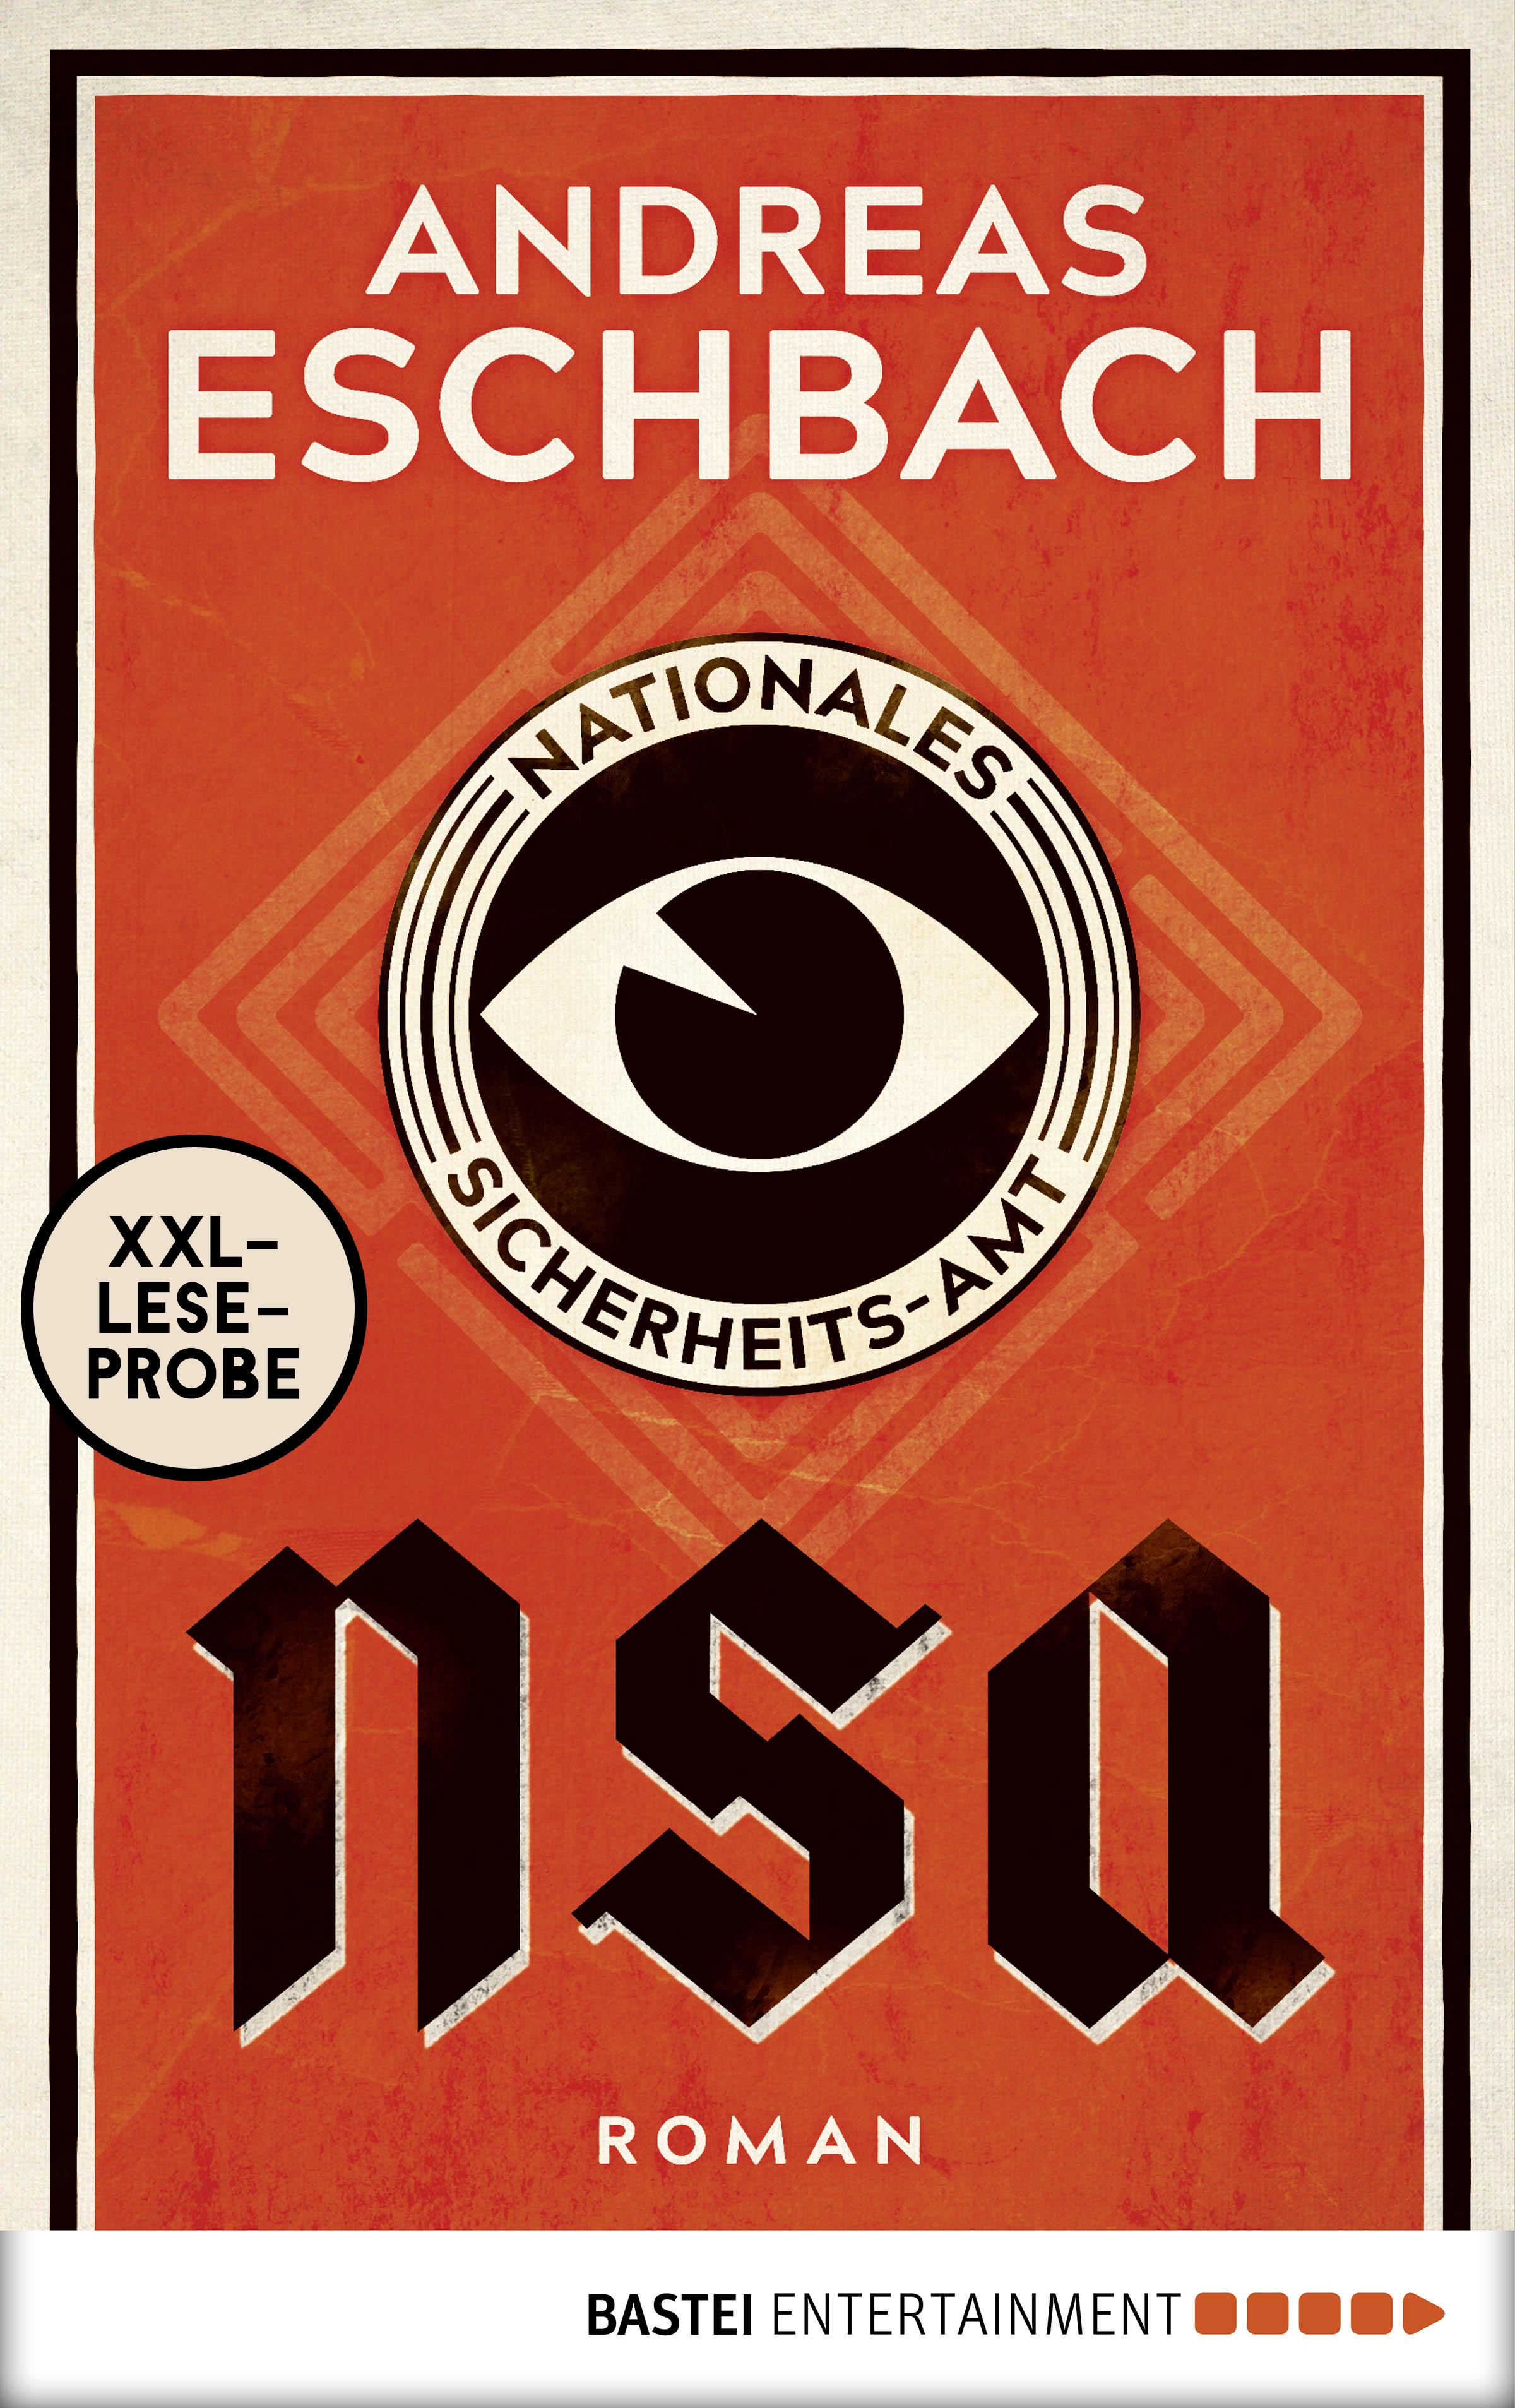 Xxl Leseprobe Nsa Nationales Sicherheits Amt Andreas Eschbach Bastei Lubbe